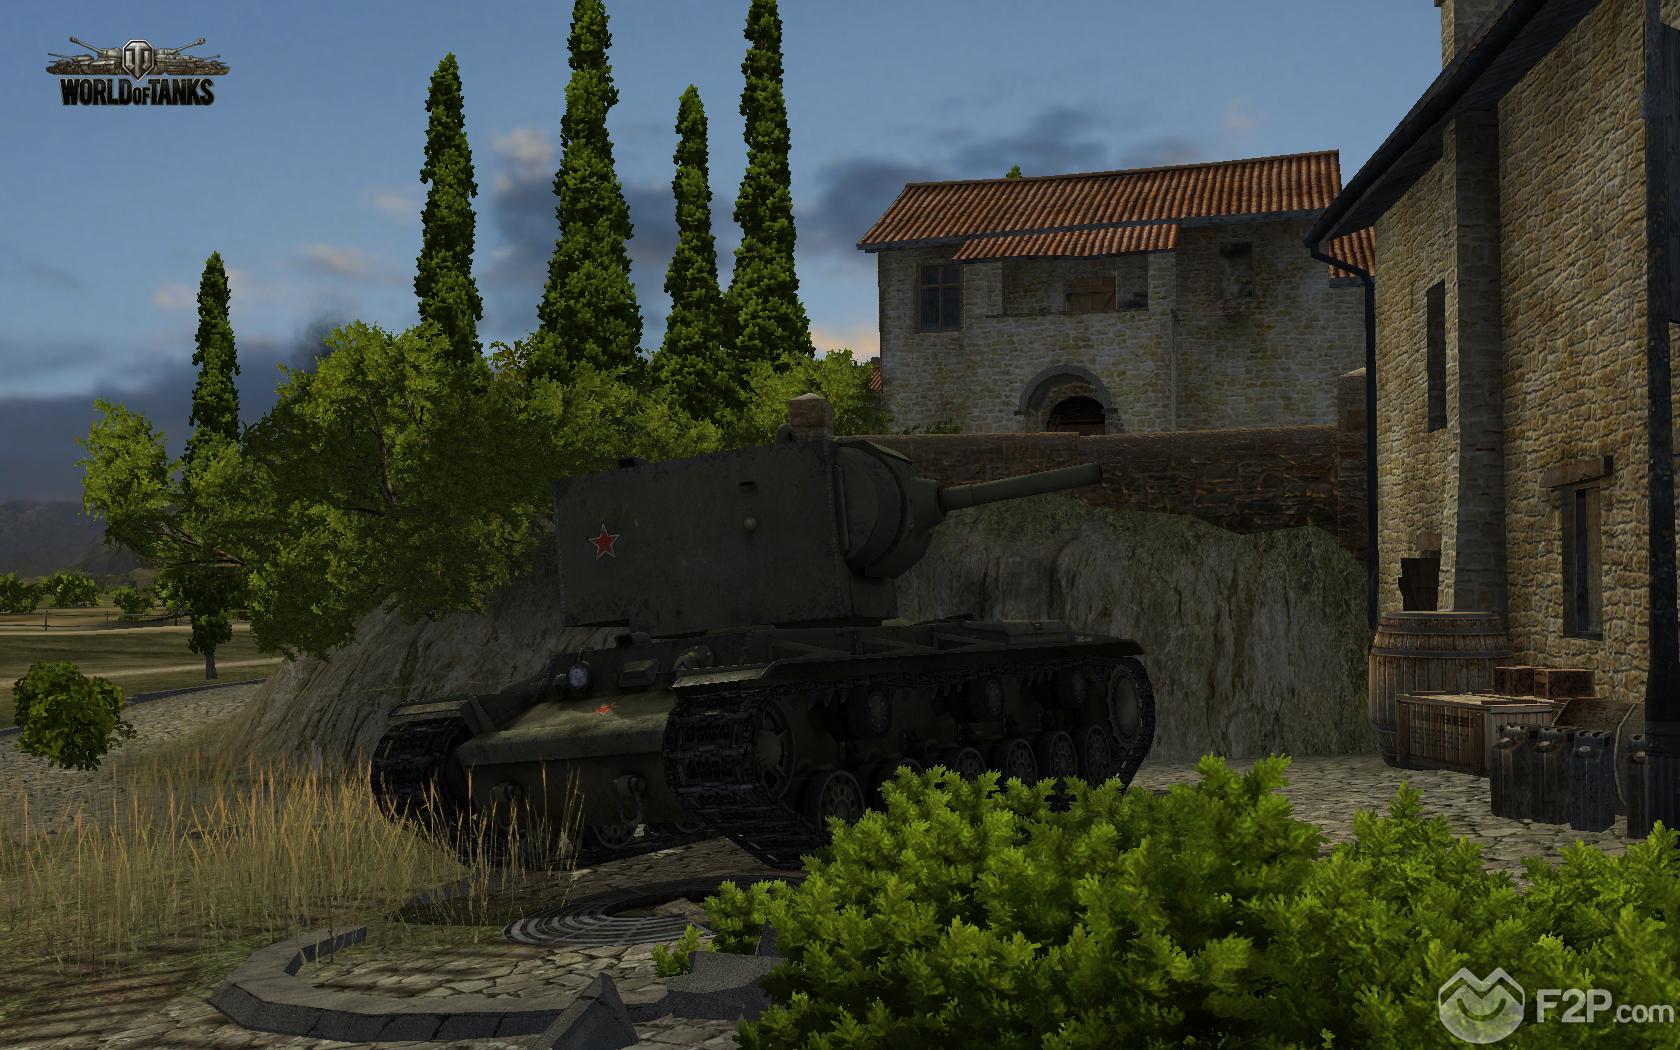 Click image for larger version.Name:World of Tanks 55.jpgViews:122Size:1.45 MBID:3852